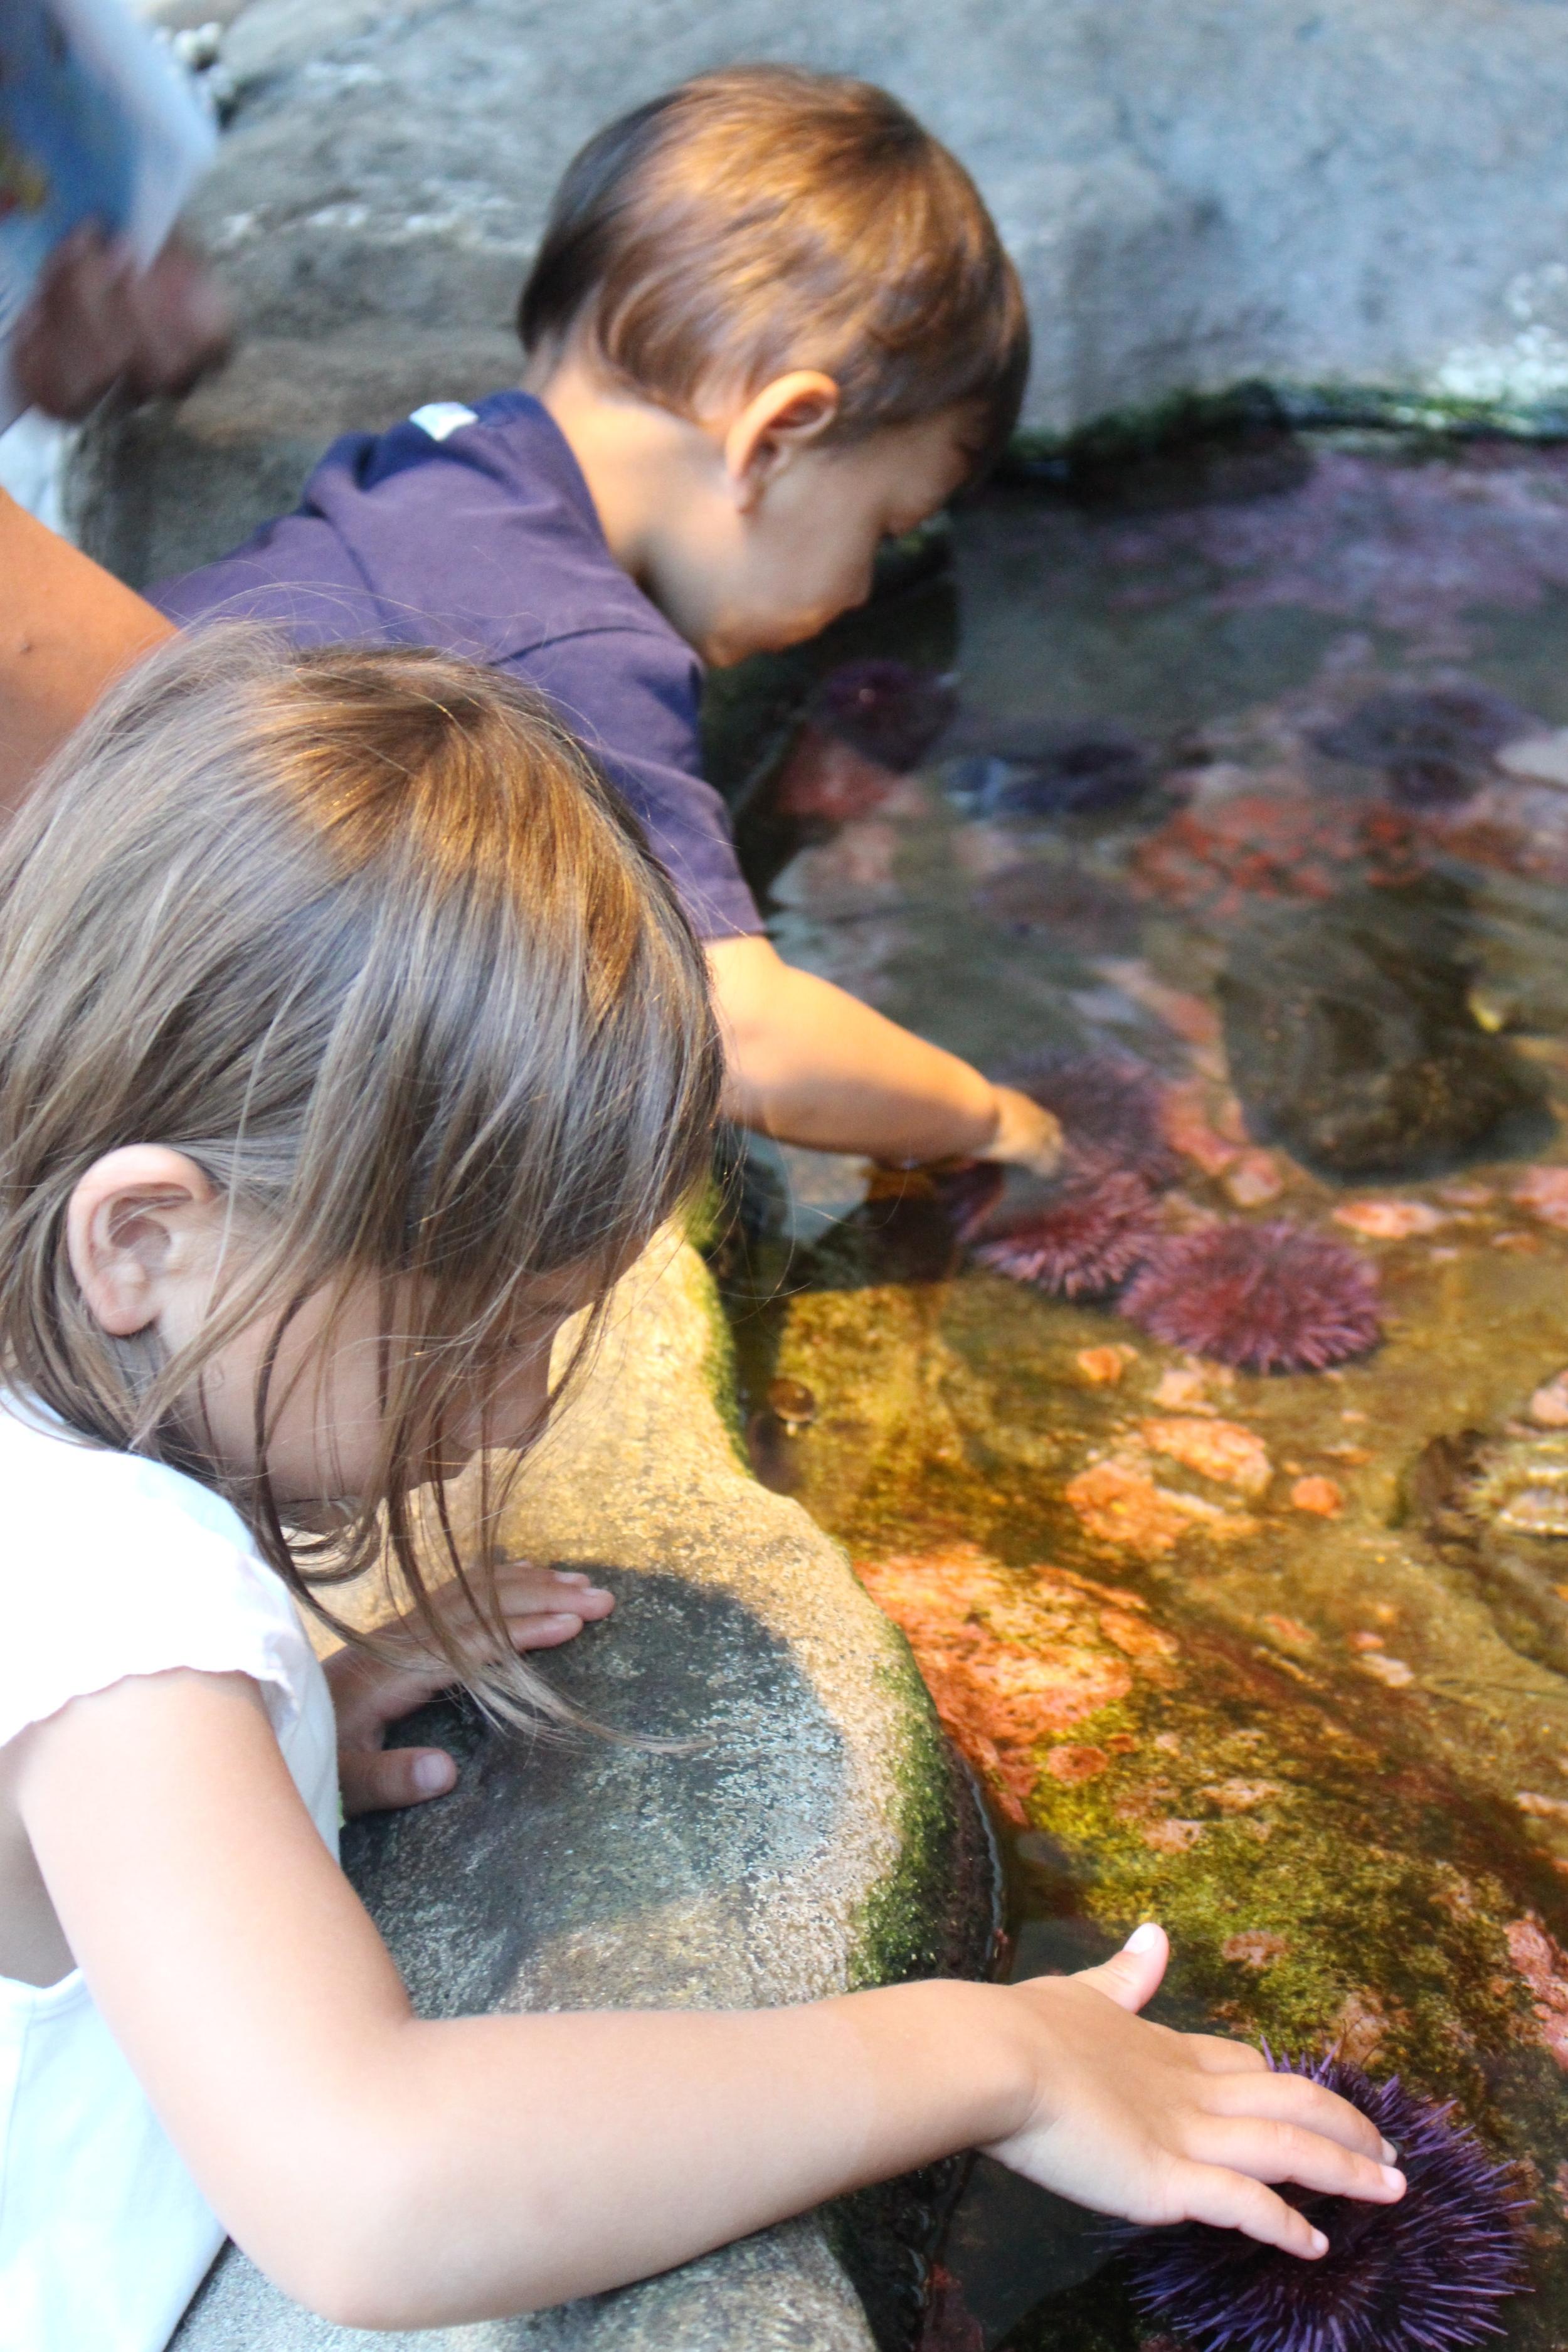 My children touching sea anemones at Hatfield Marine Science Visitor's Center tidepool exhibit